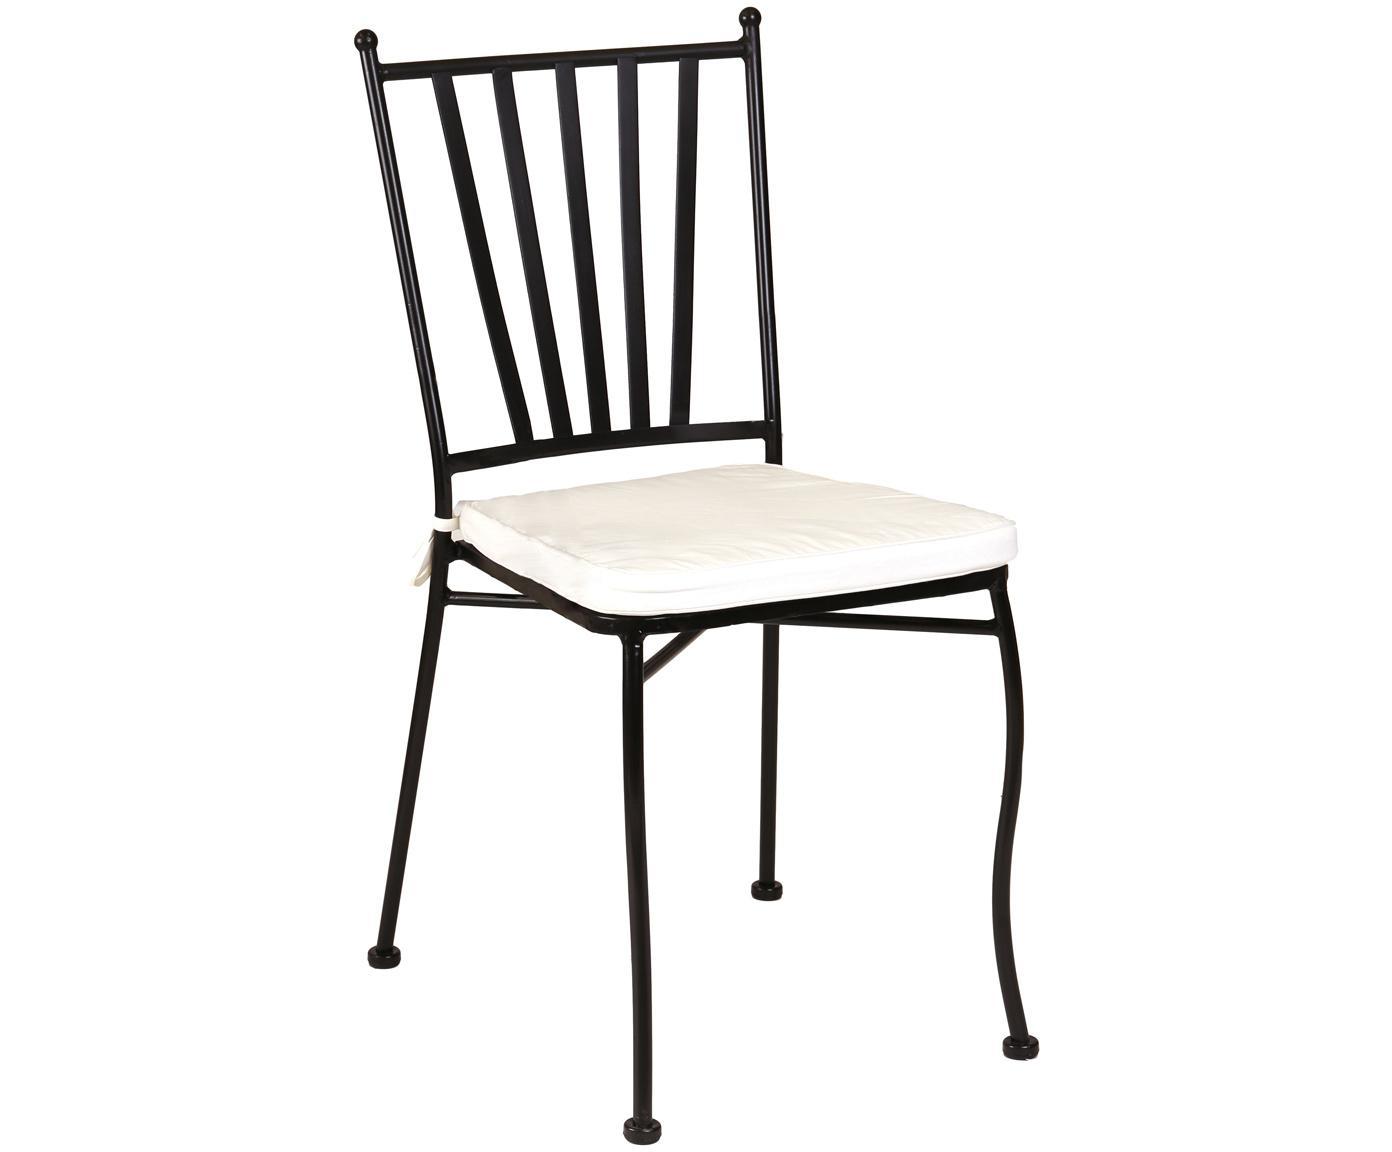 Gartenstuhl Helen aus Metall mit Sitzpolster, Gestell: Metall, pulverbeschichtet, Bezug: Polyester, Schwarz, Weiss, B 41 x T 53 cm